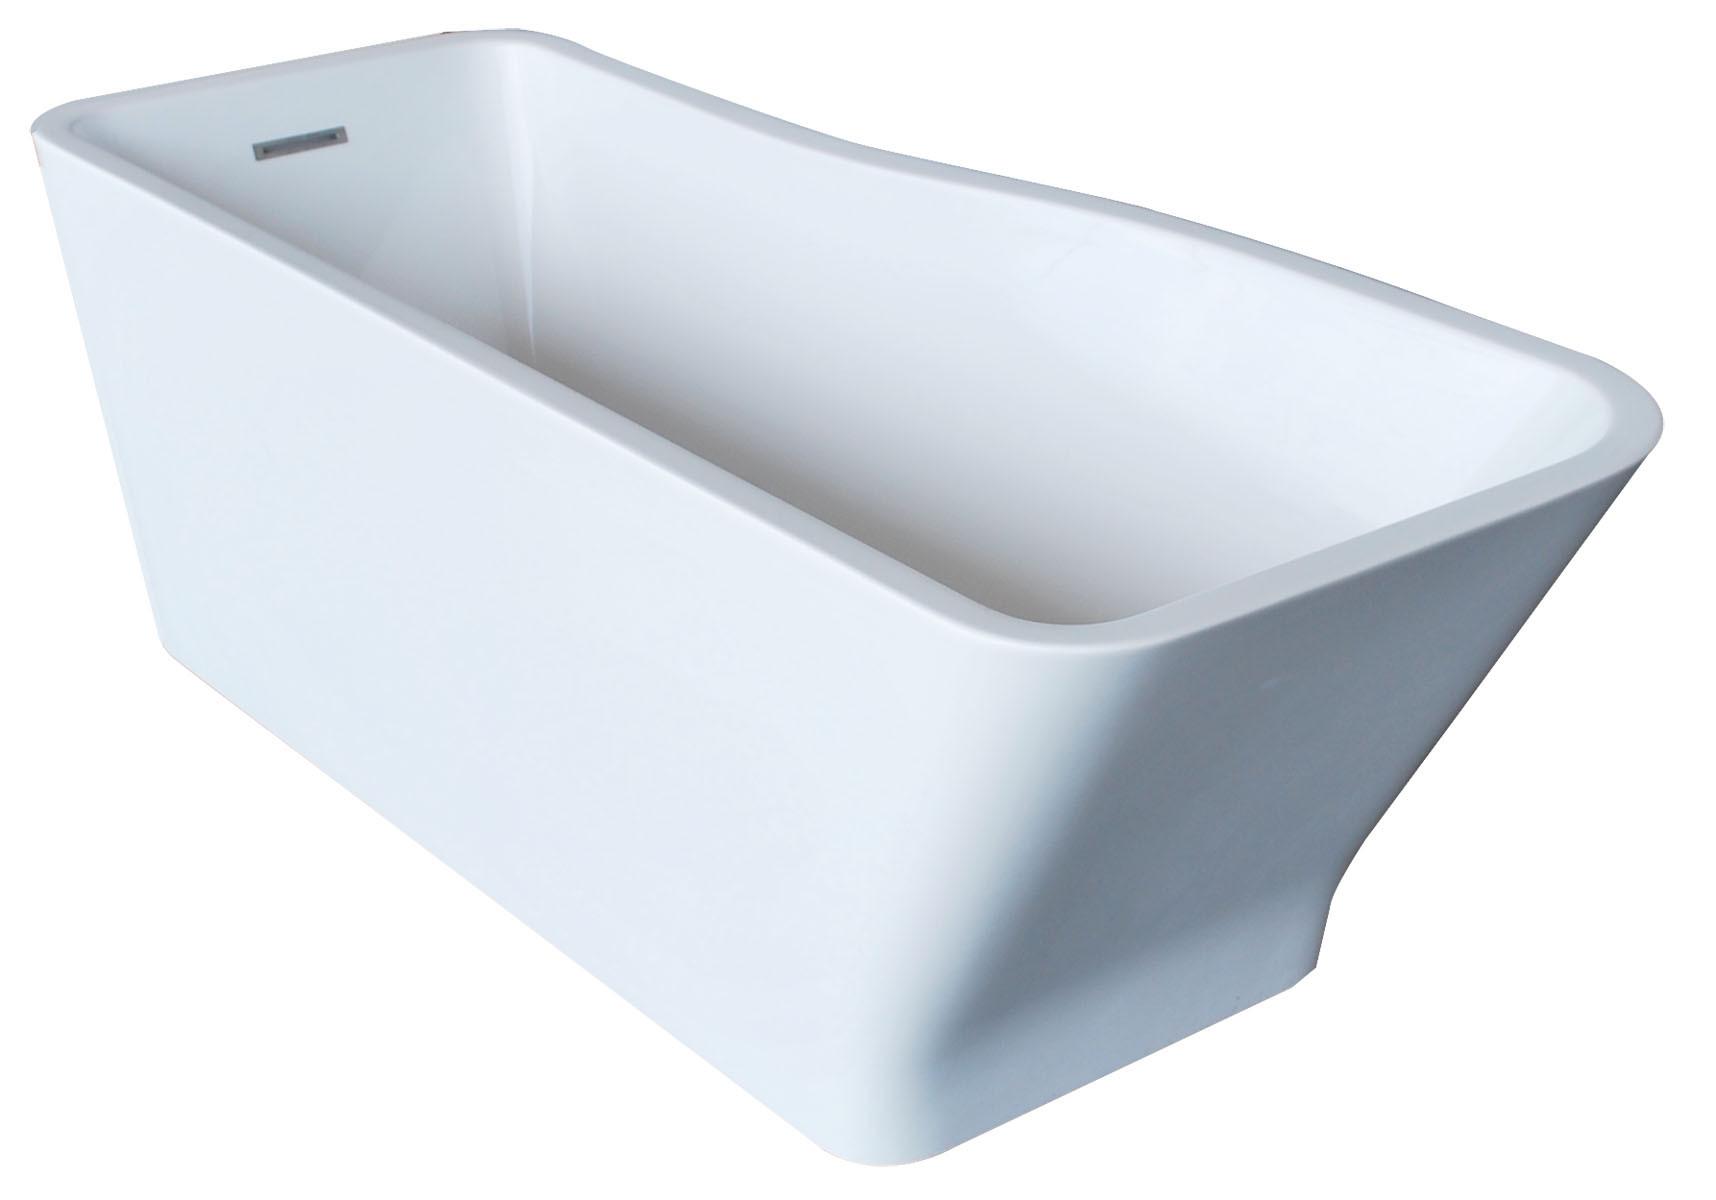 Anzzi FT-AZ004 Salva Reversible Drain Freestanding Bathtub In Glossy White